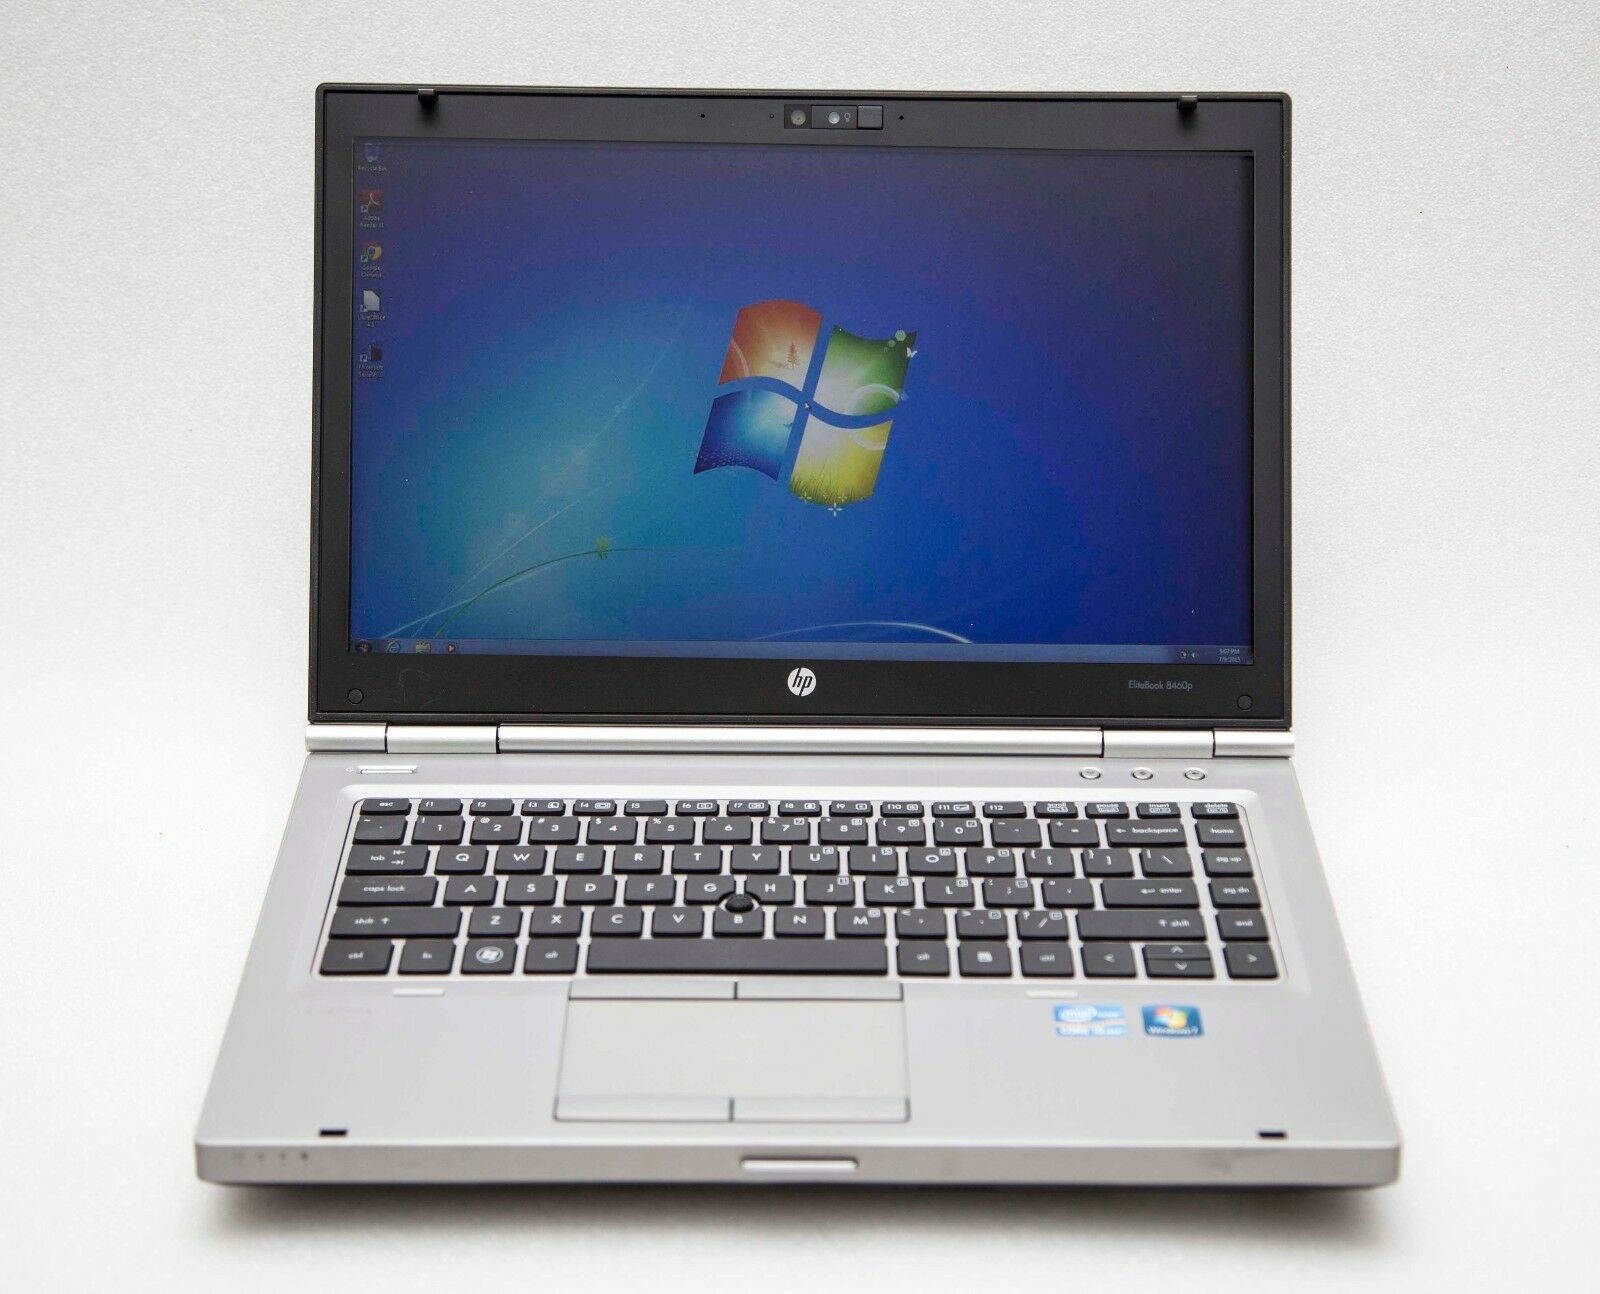 "HP EliteBook 8460p 14"" Core i5-2520M 2.5/4G/320GB 1600x900 ATI 1GB Gaming Laptop"